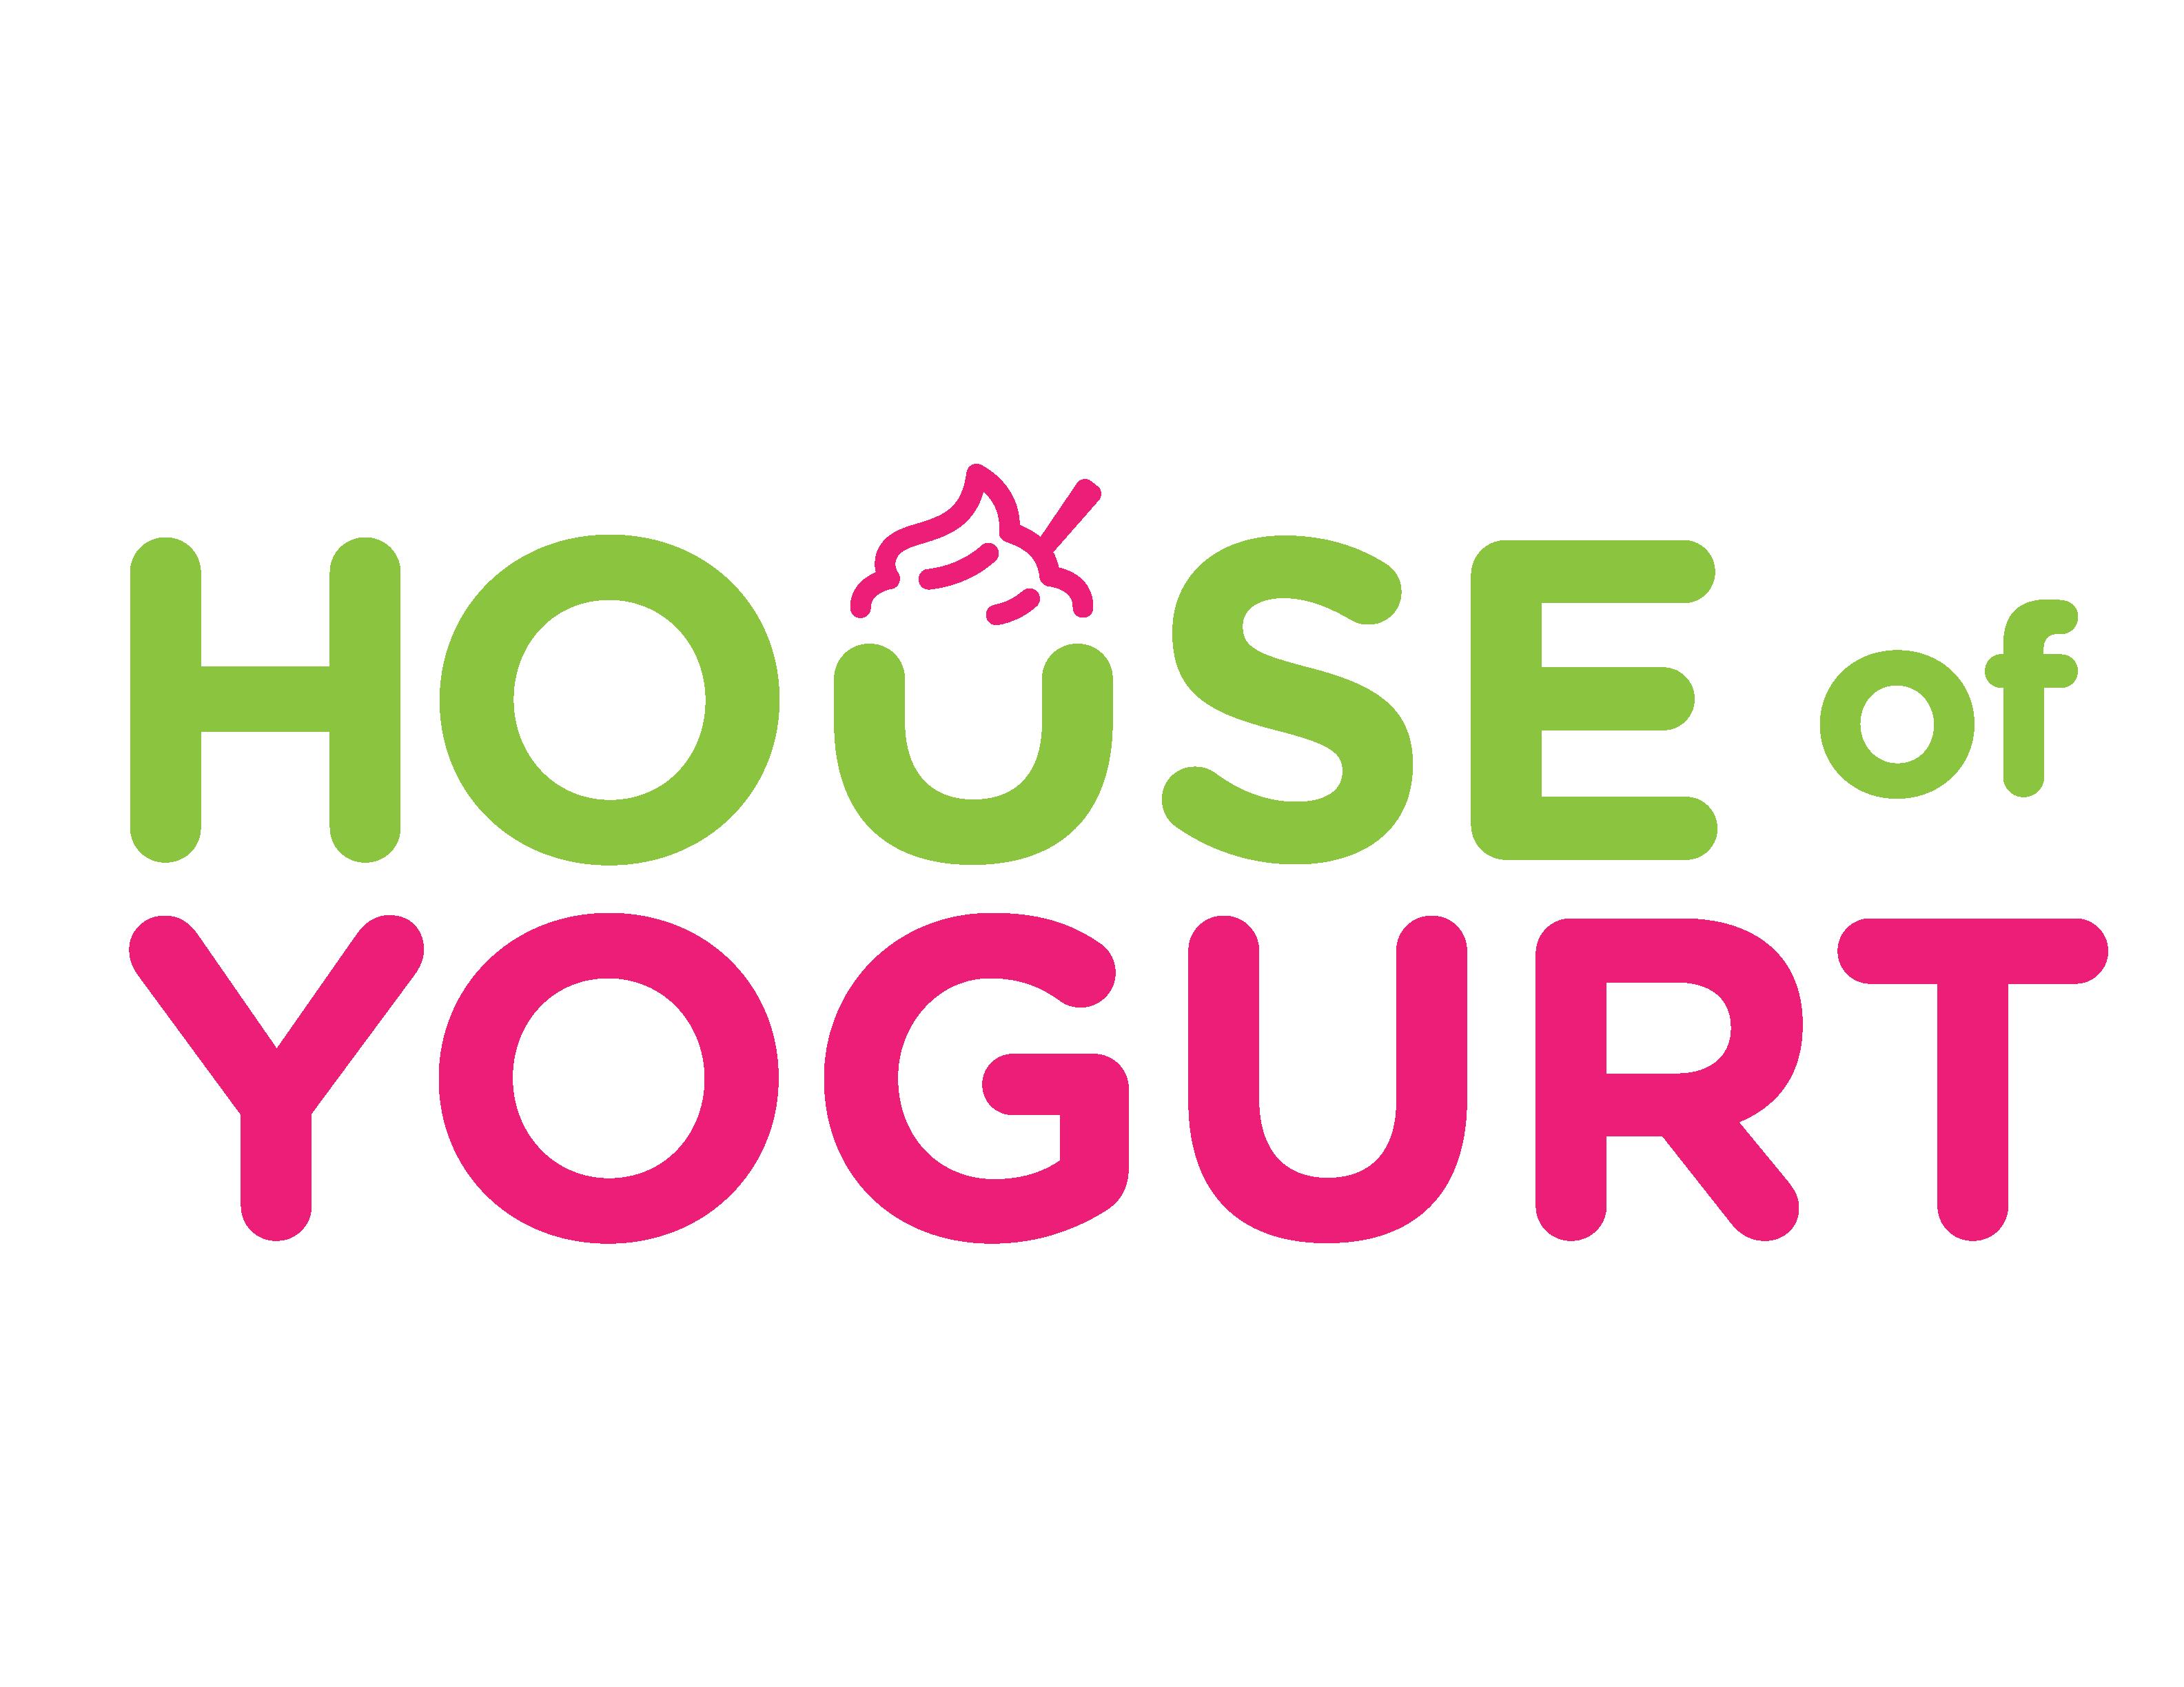 house of yog